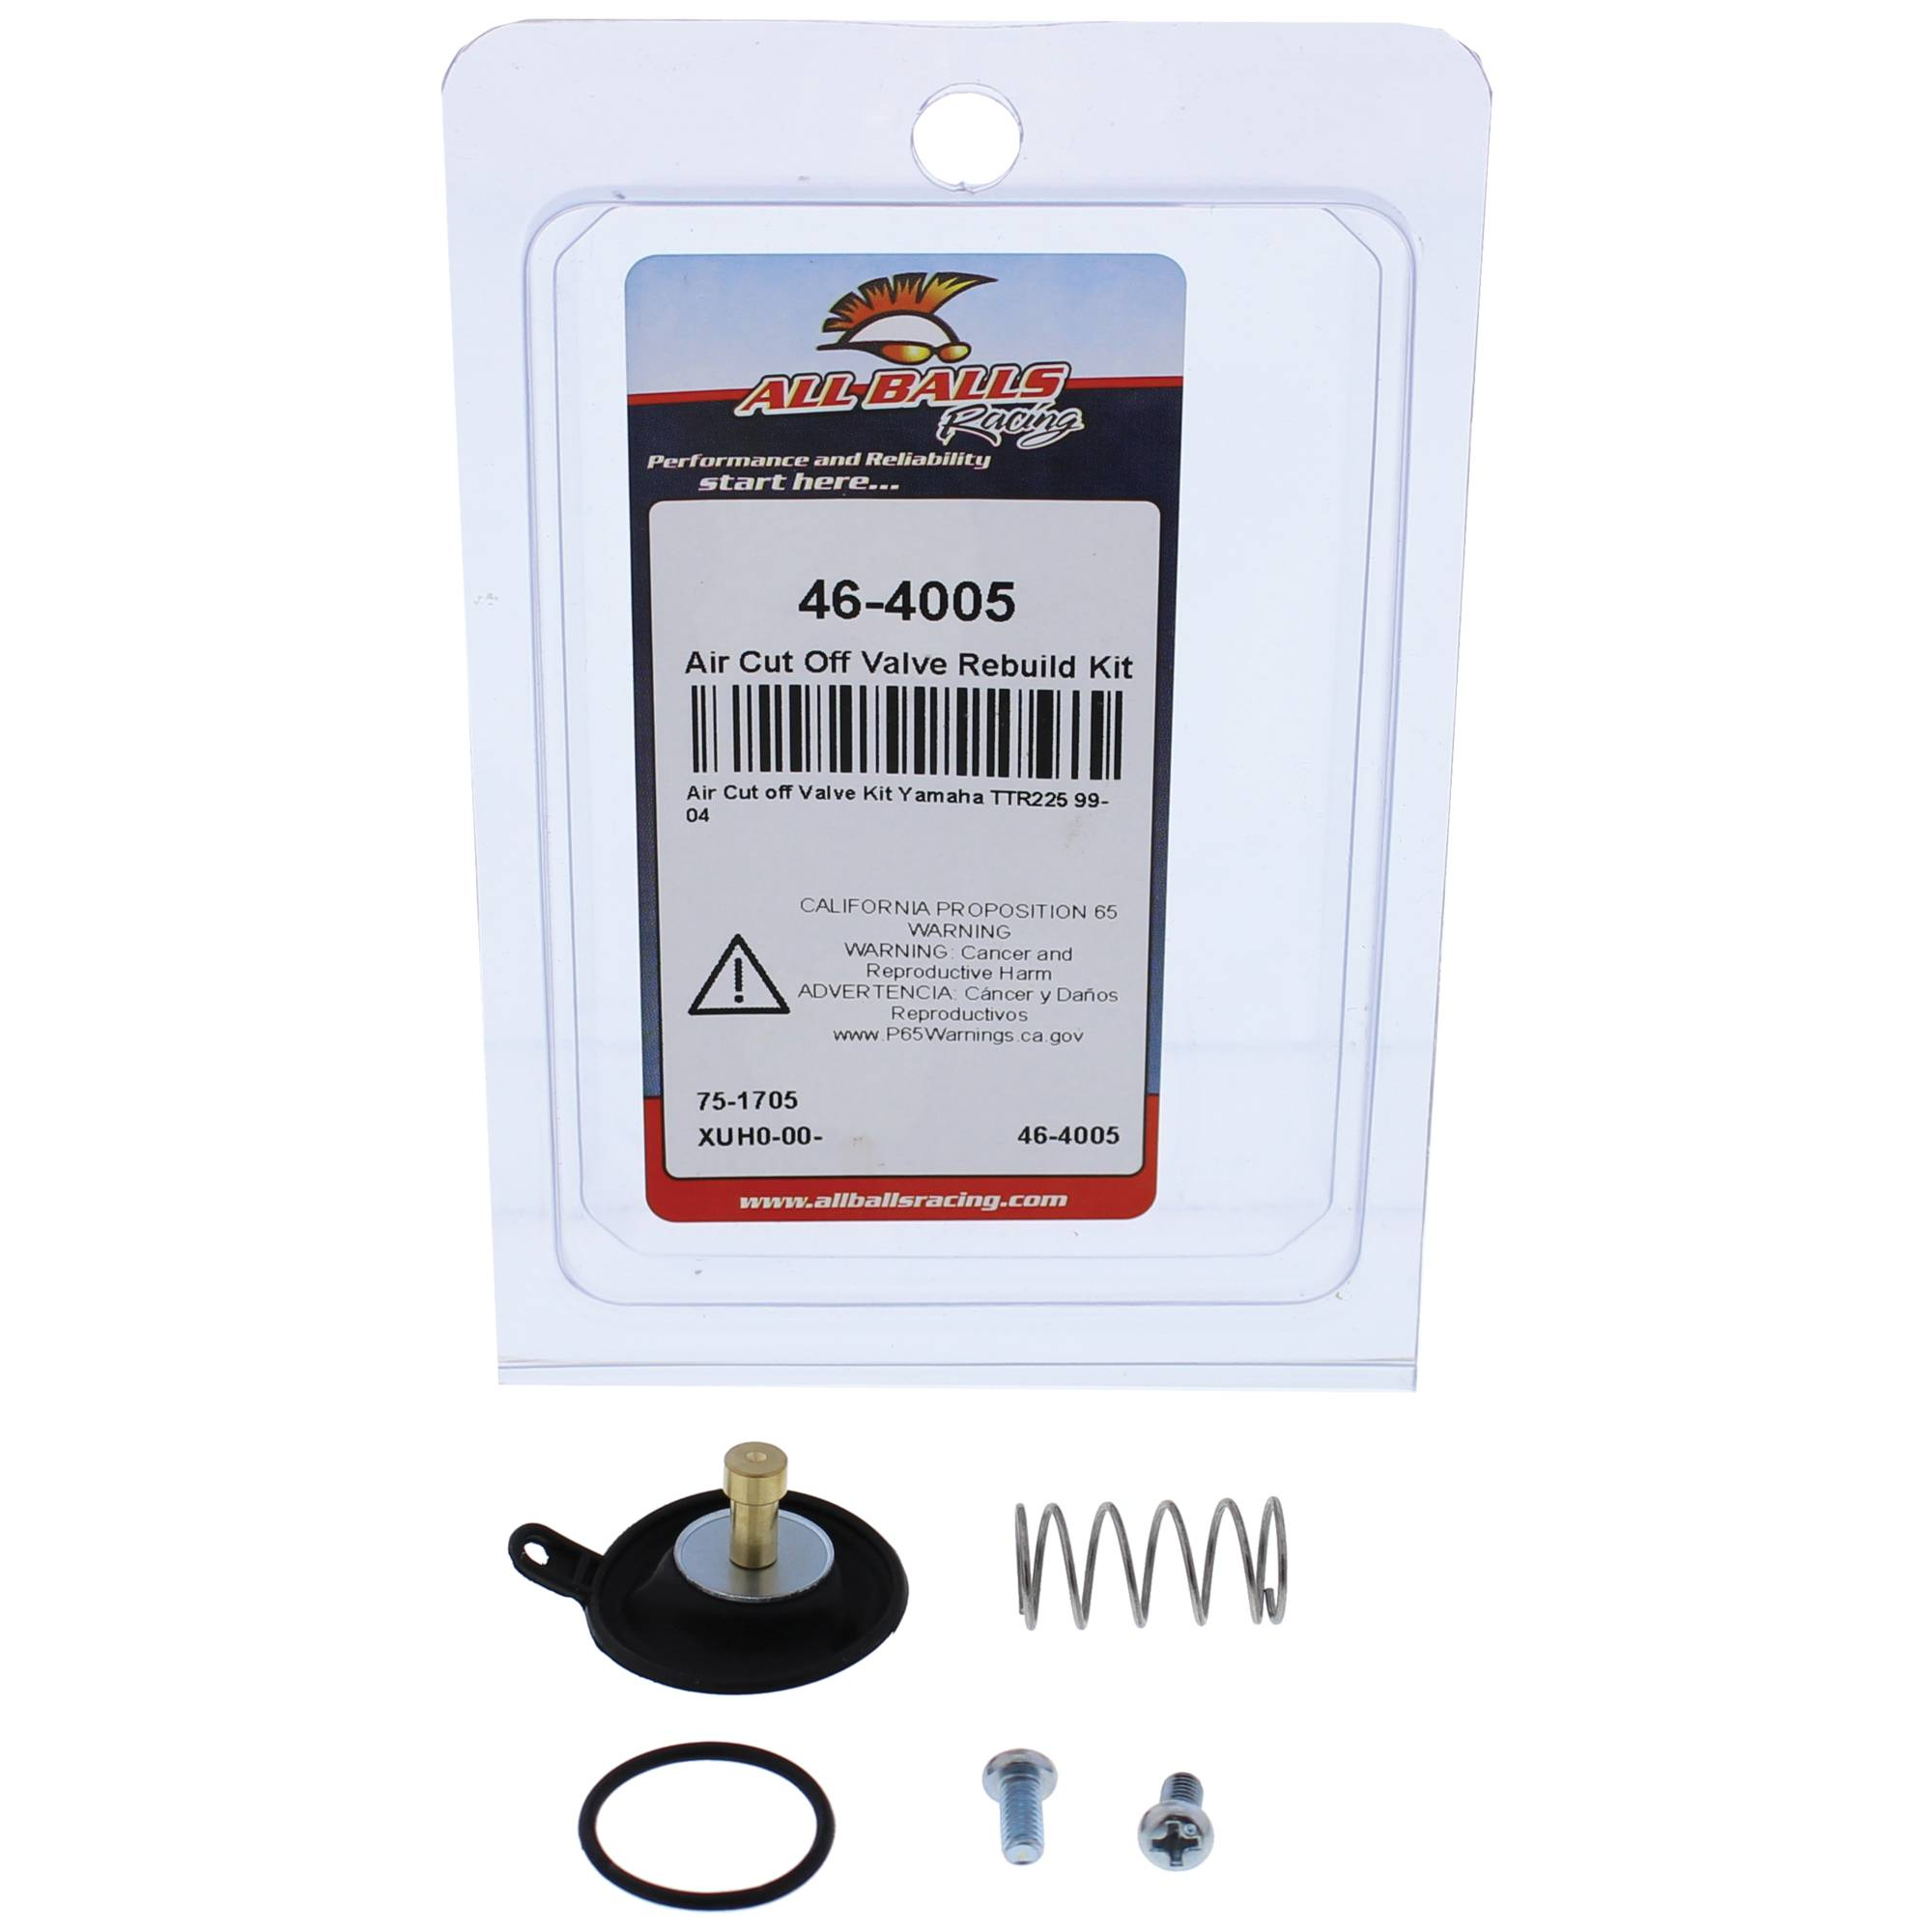 Heyco 4511002080 Cross slot screwdriver4511 2C